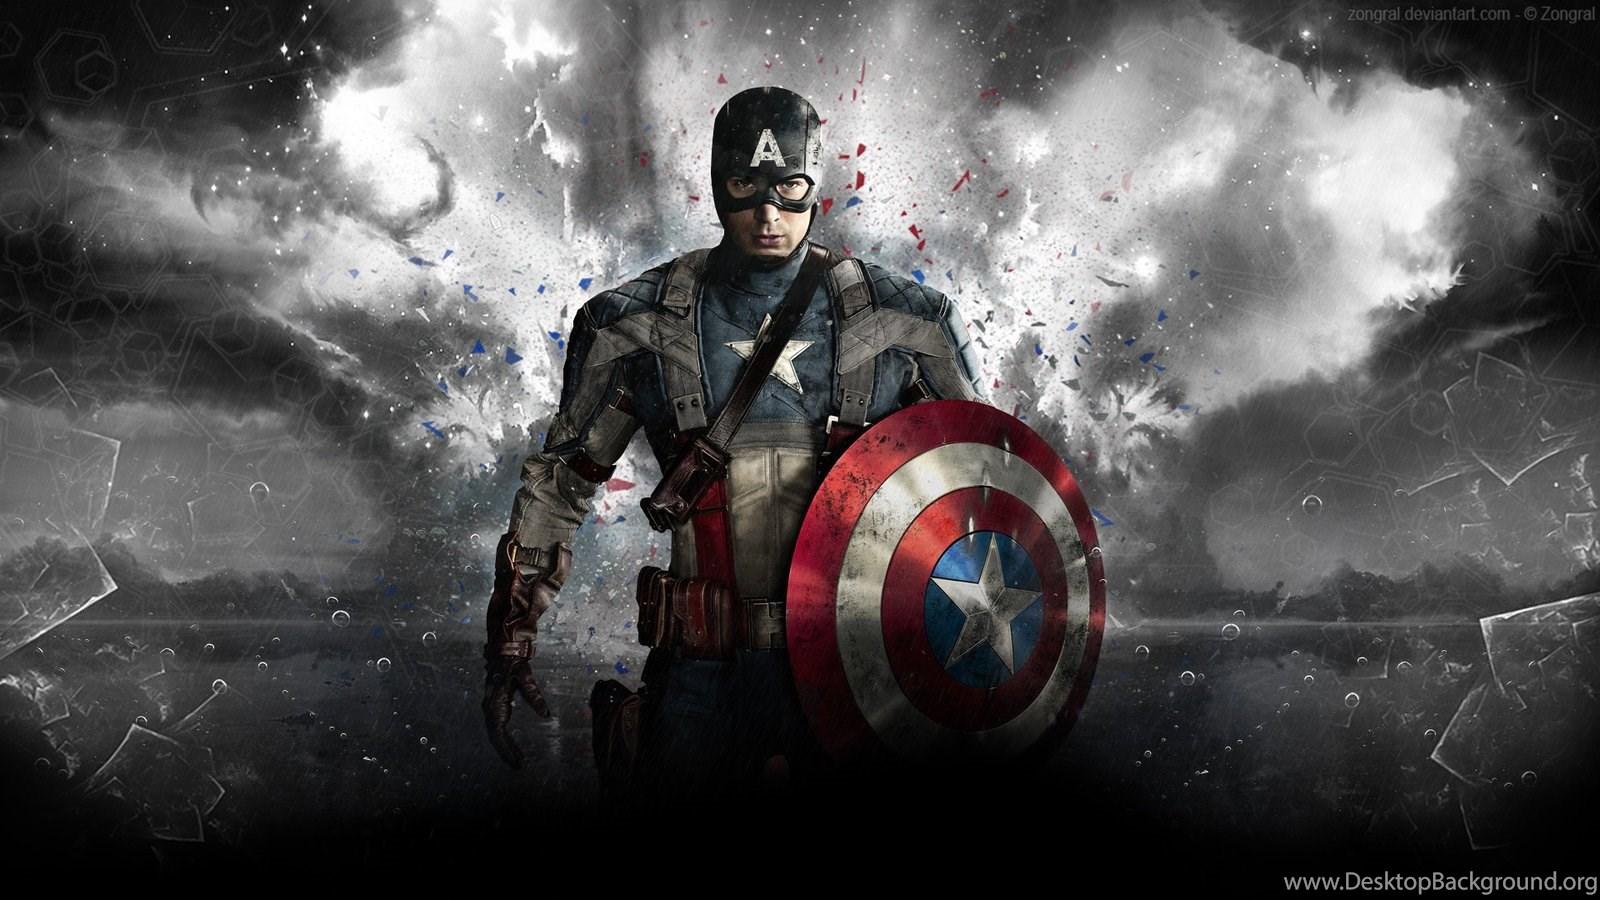 Captain america shield marvel chris evans hd wallpaper movies desktop background - Image captain america ...